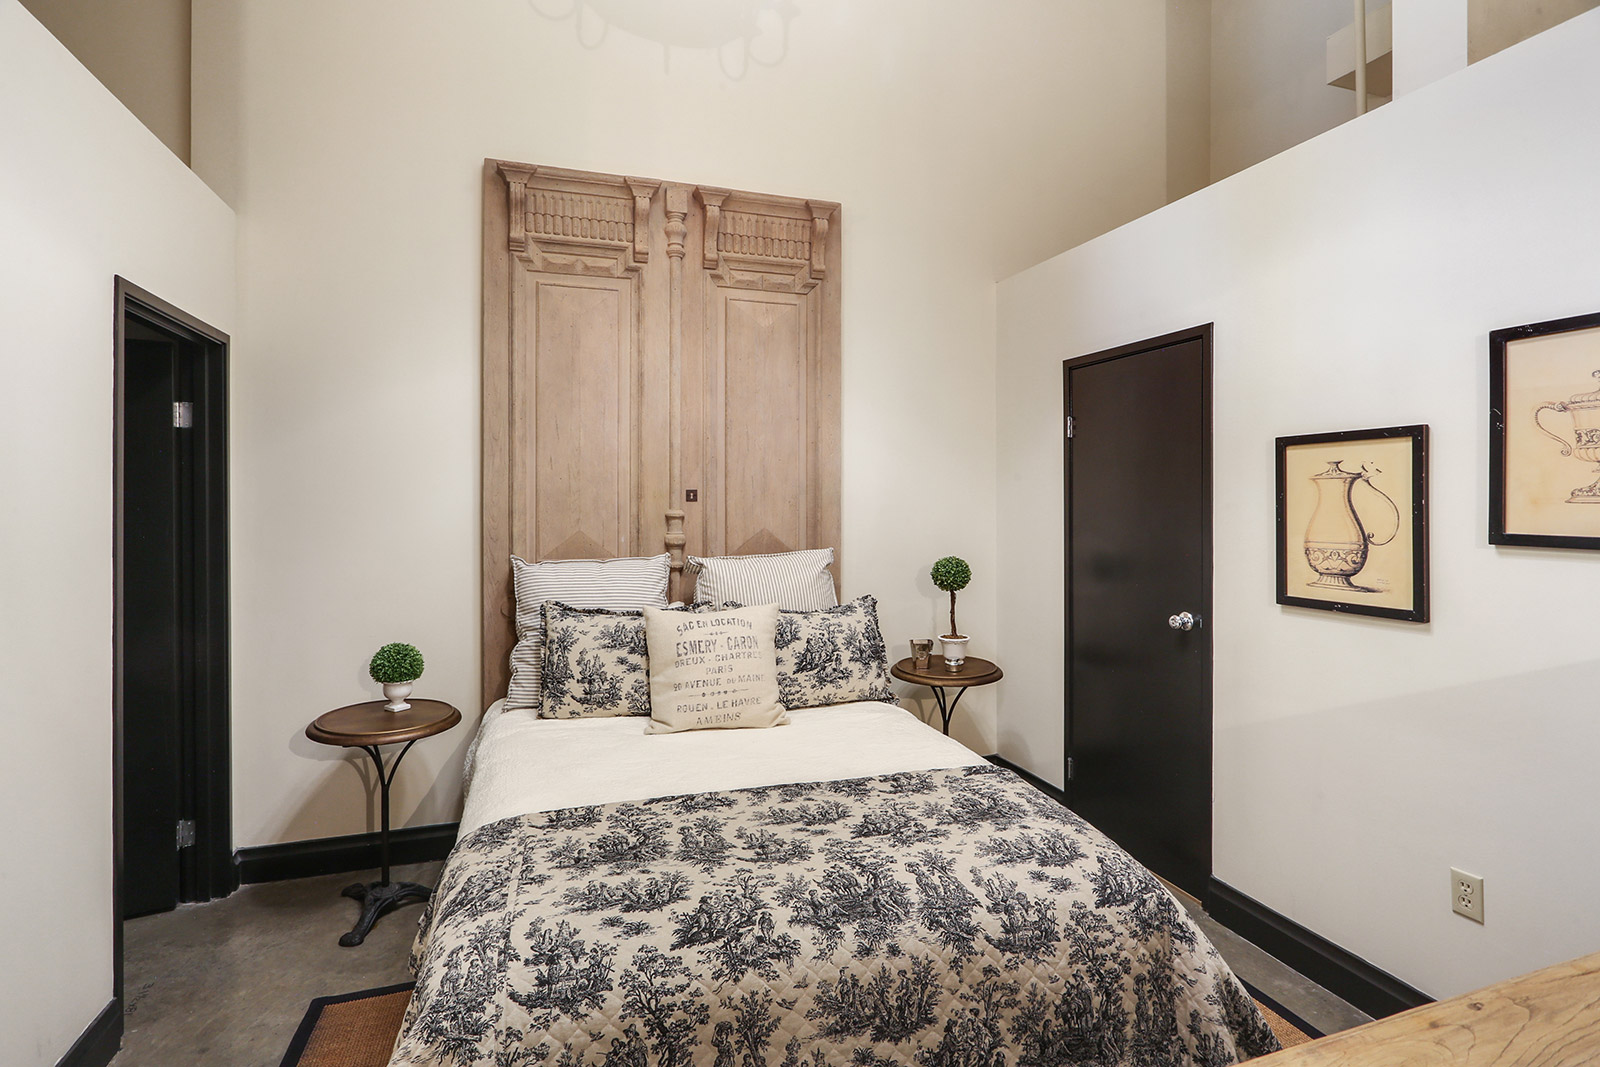 CBD/Warehouse District/South Market, Condo, 1 beds, 1.0 baths, $2400 per month New Orleans Rental - devie image_4